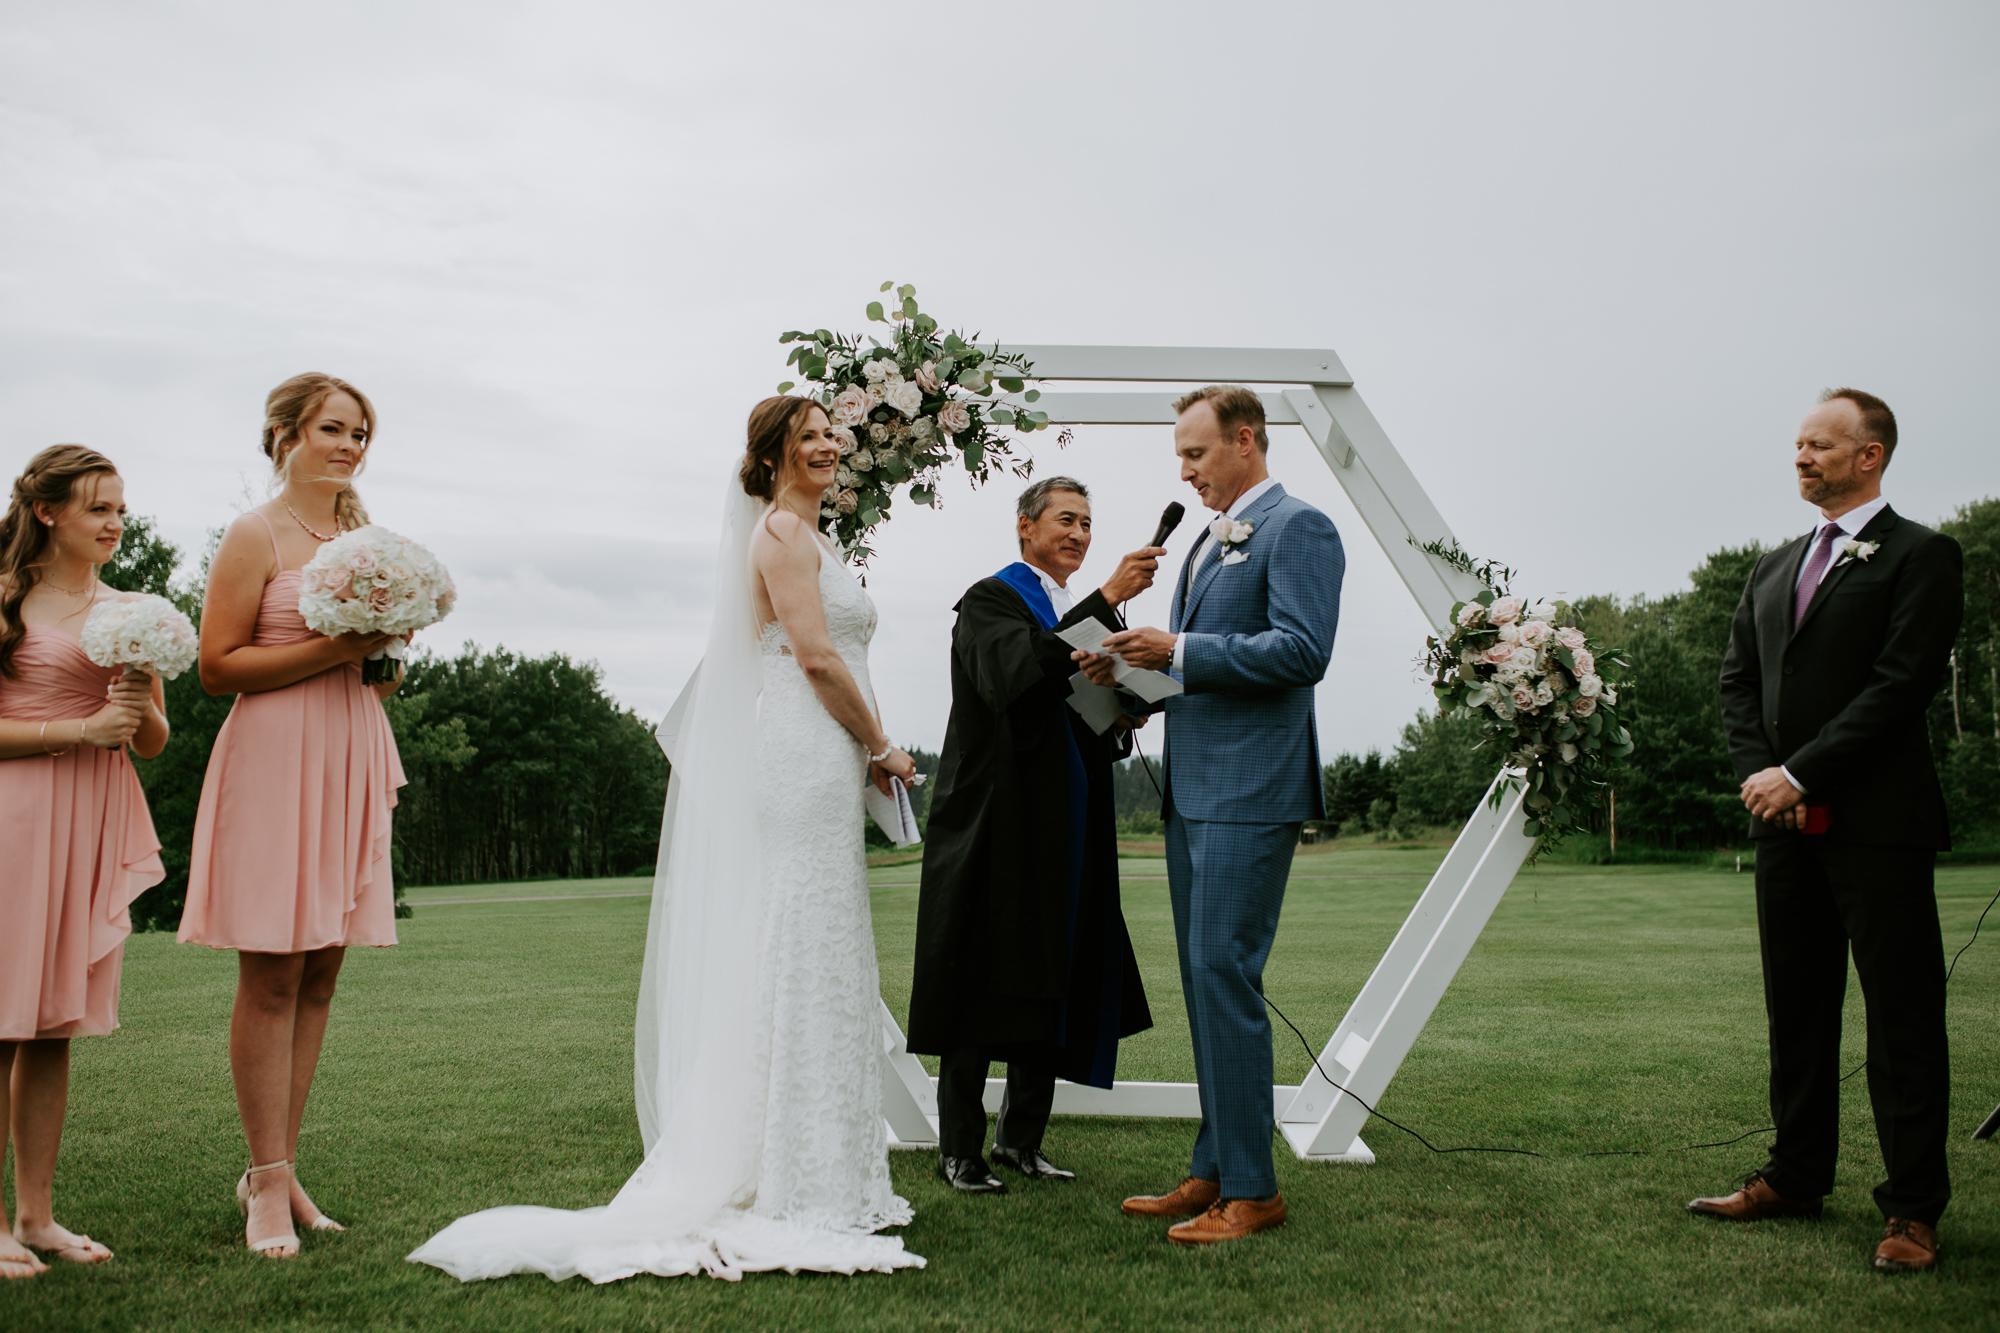 Priddis-Wedding-Photographer-JG-29.jpg